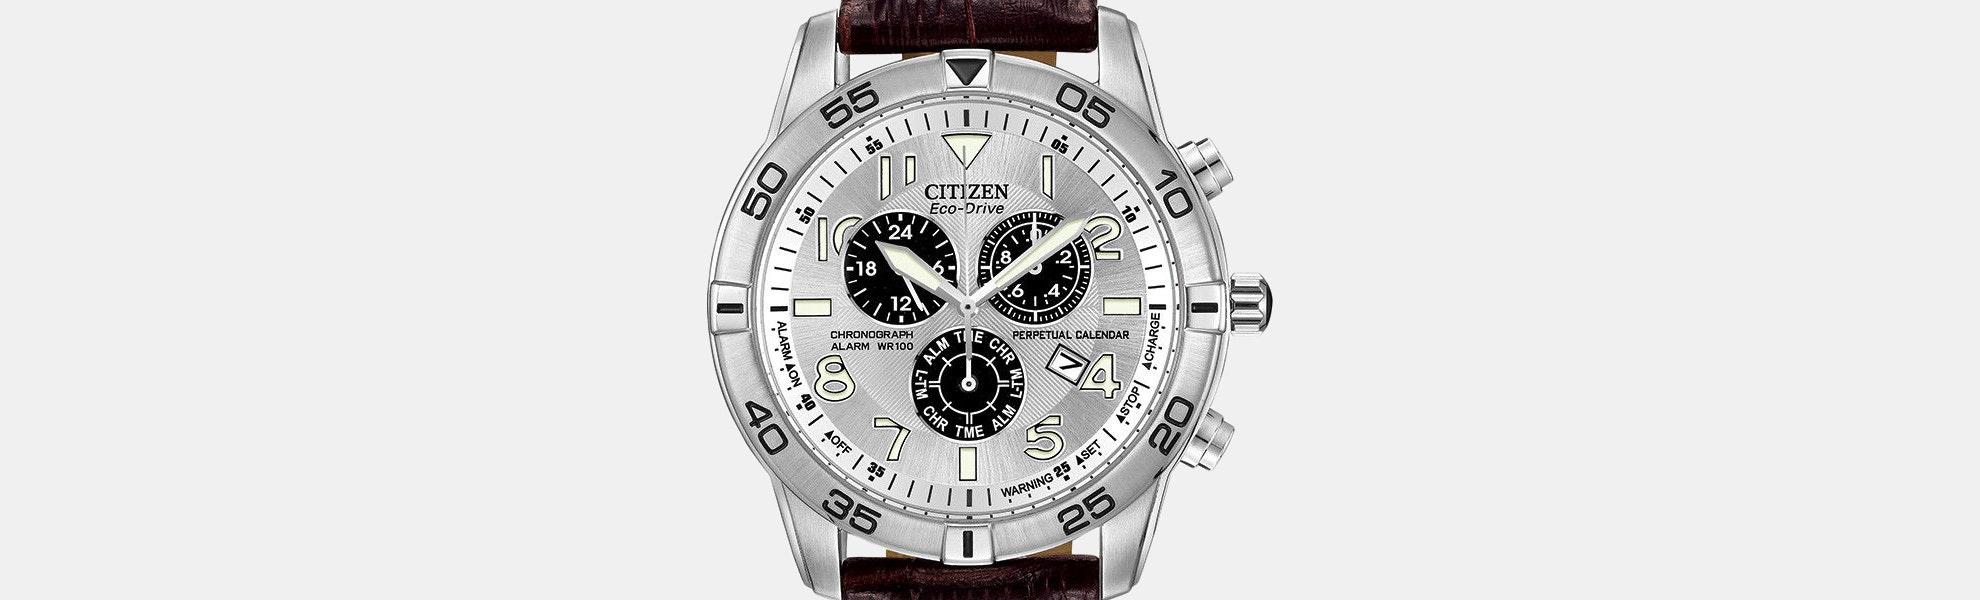 Citizen BL5470 Eco-Drive Solar Watch